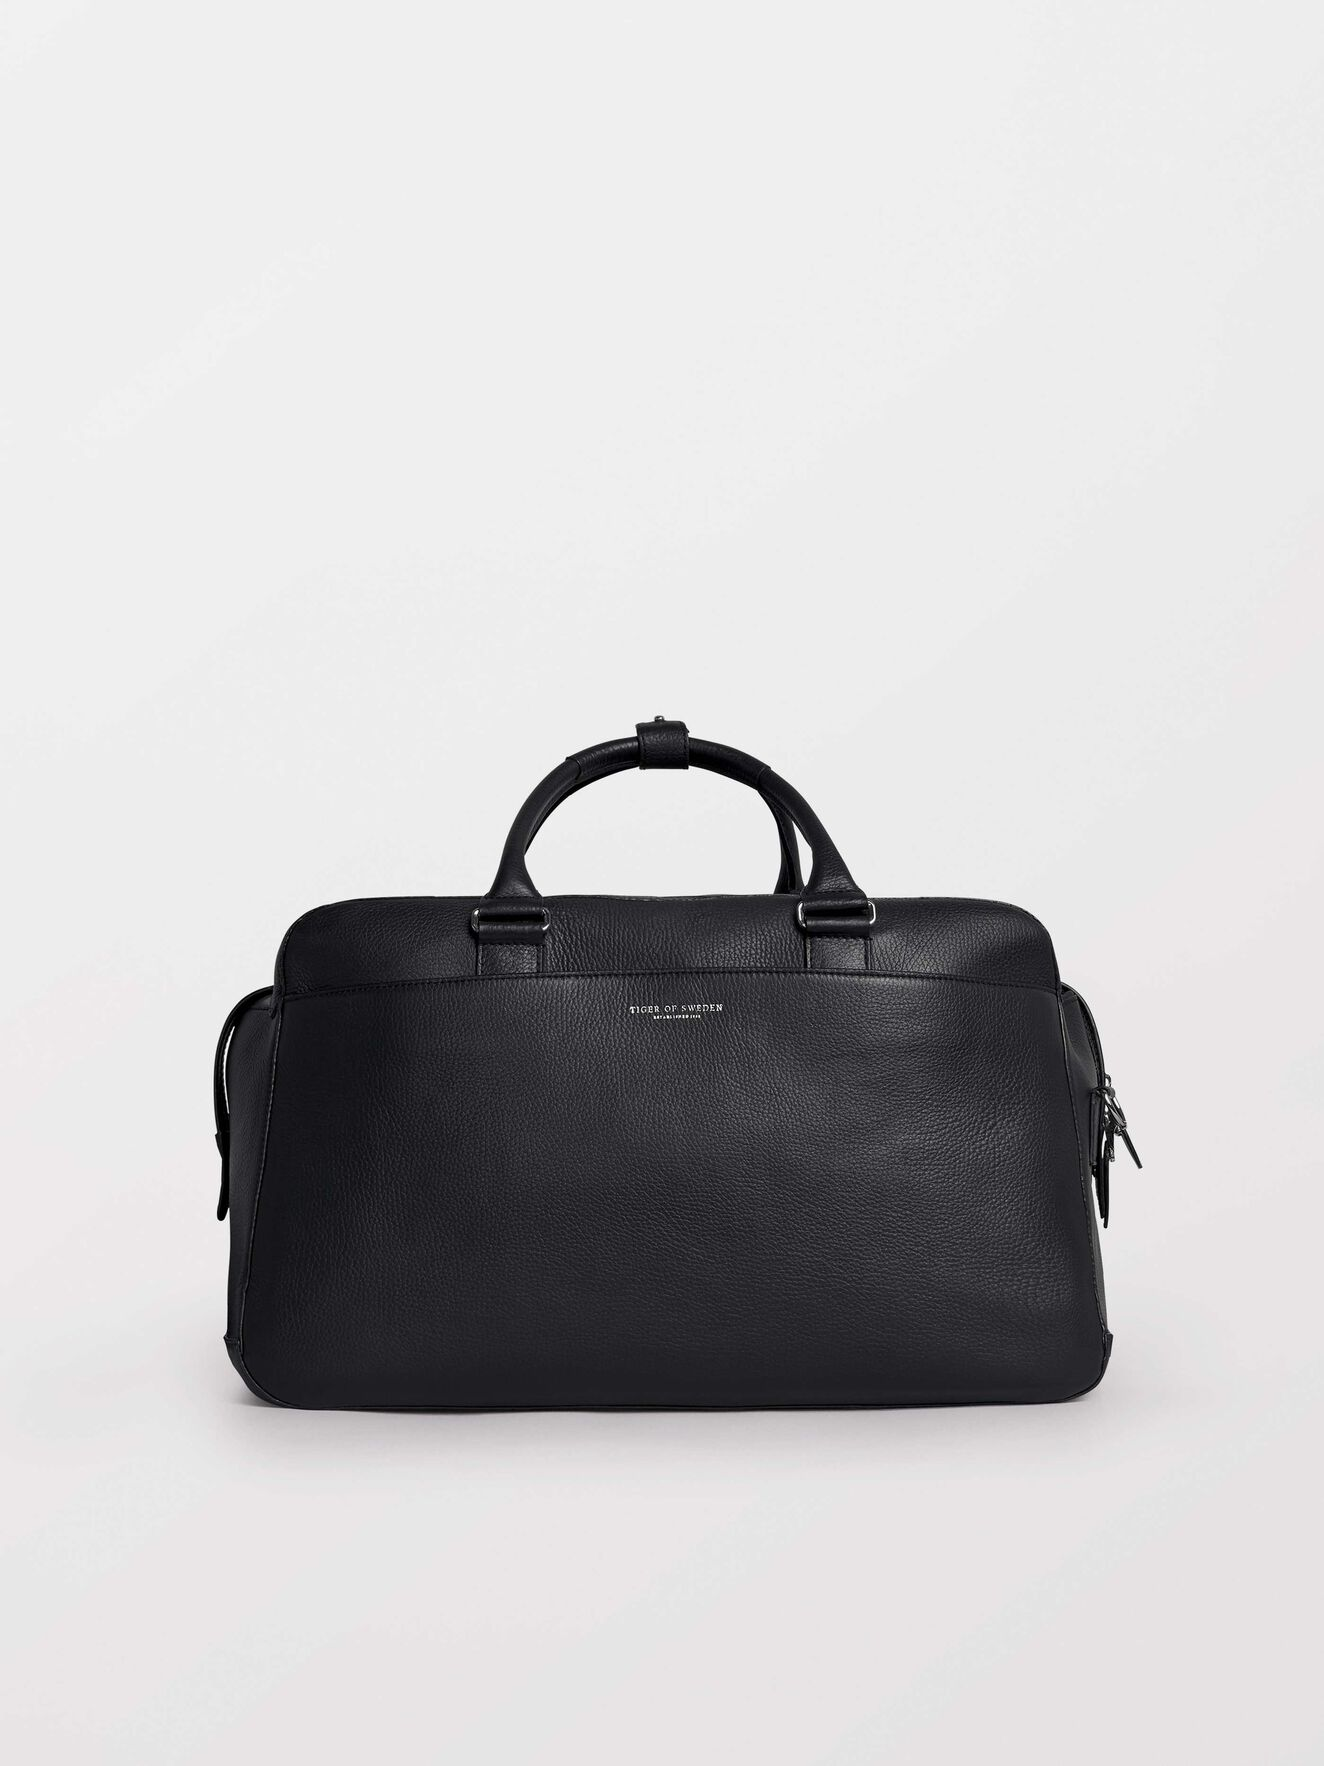 Micke 2 Weekend Bag in Black from Tiger of Sweden